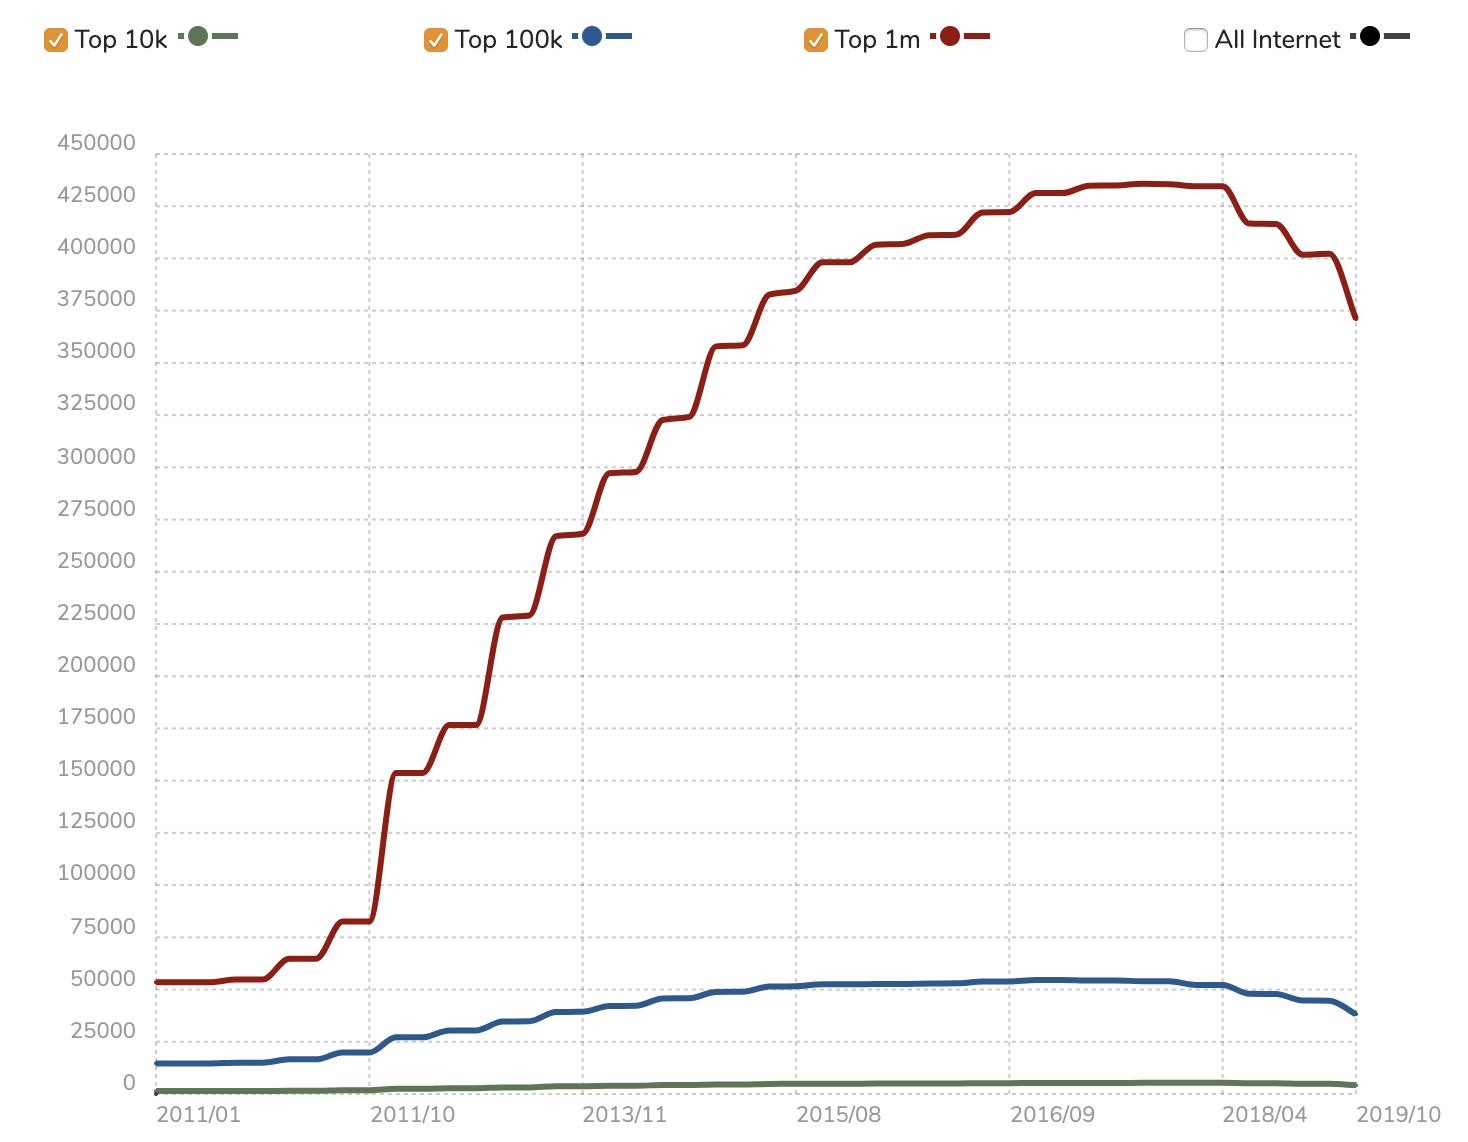 PHP Usage Statistics